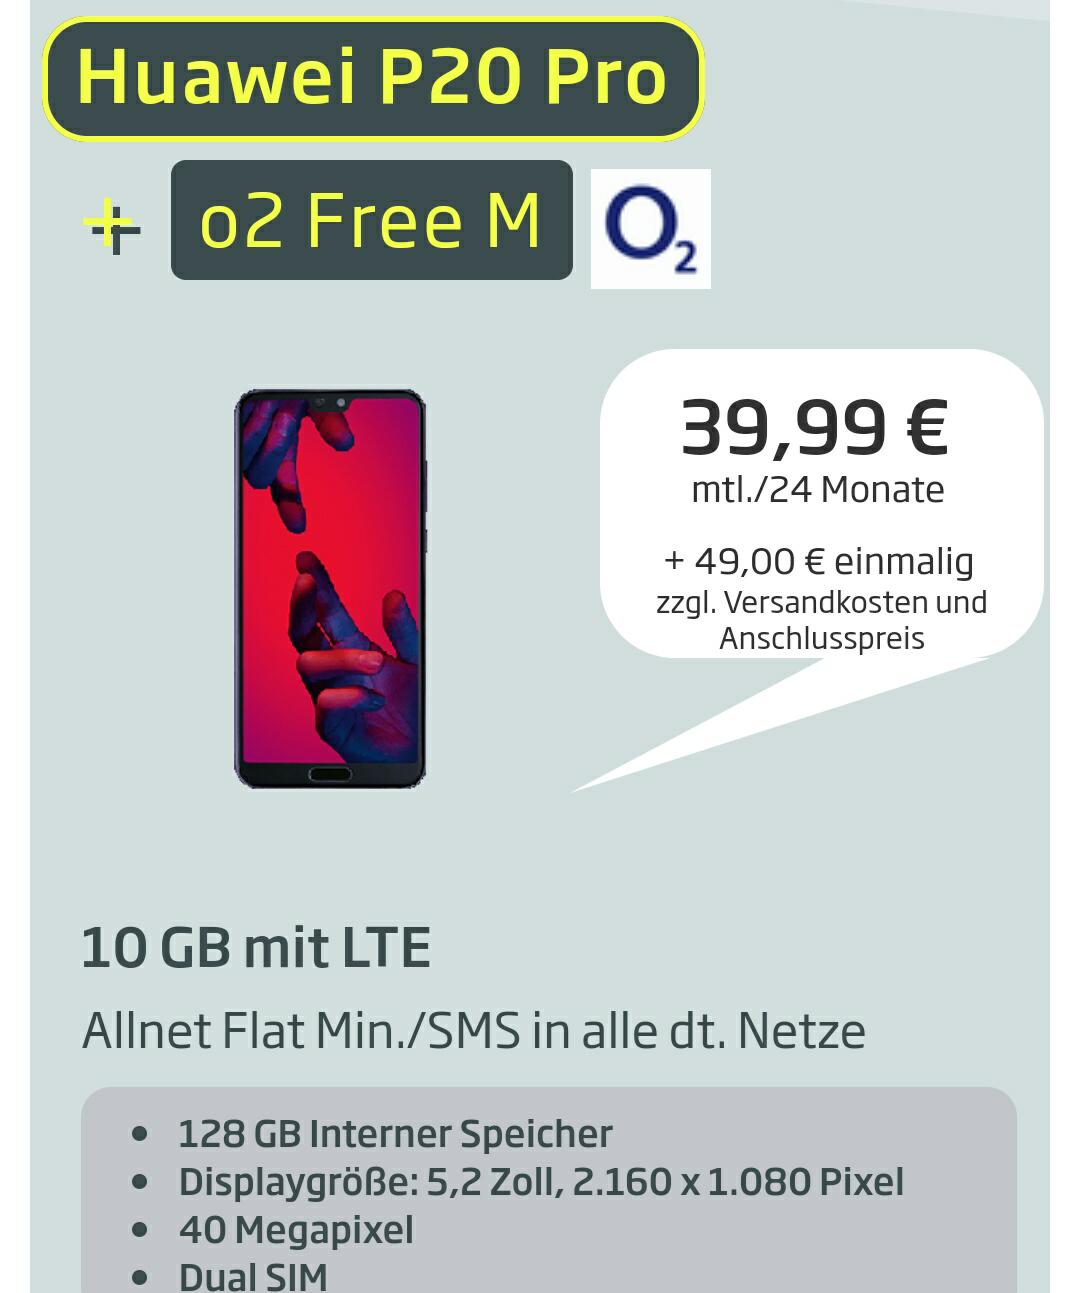 Huawei P20 Pro + O2 Free M + 150€ Amazon